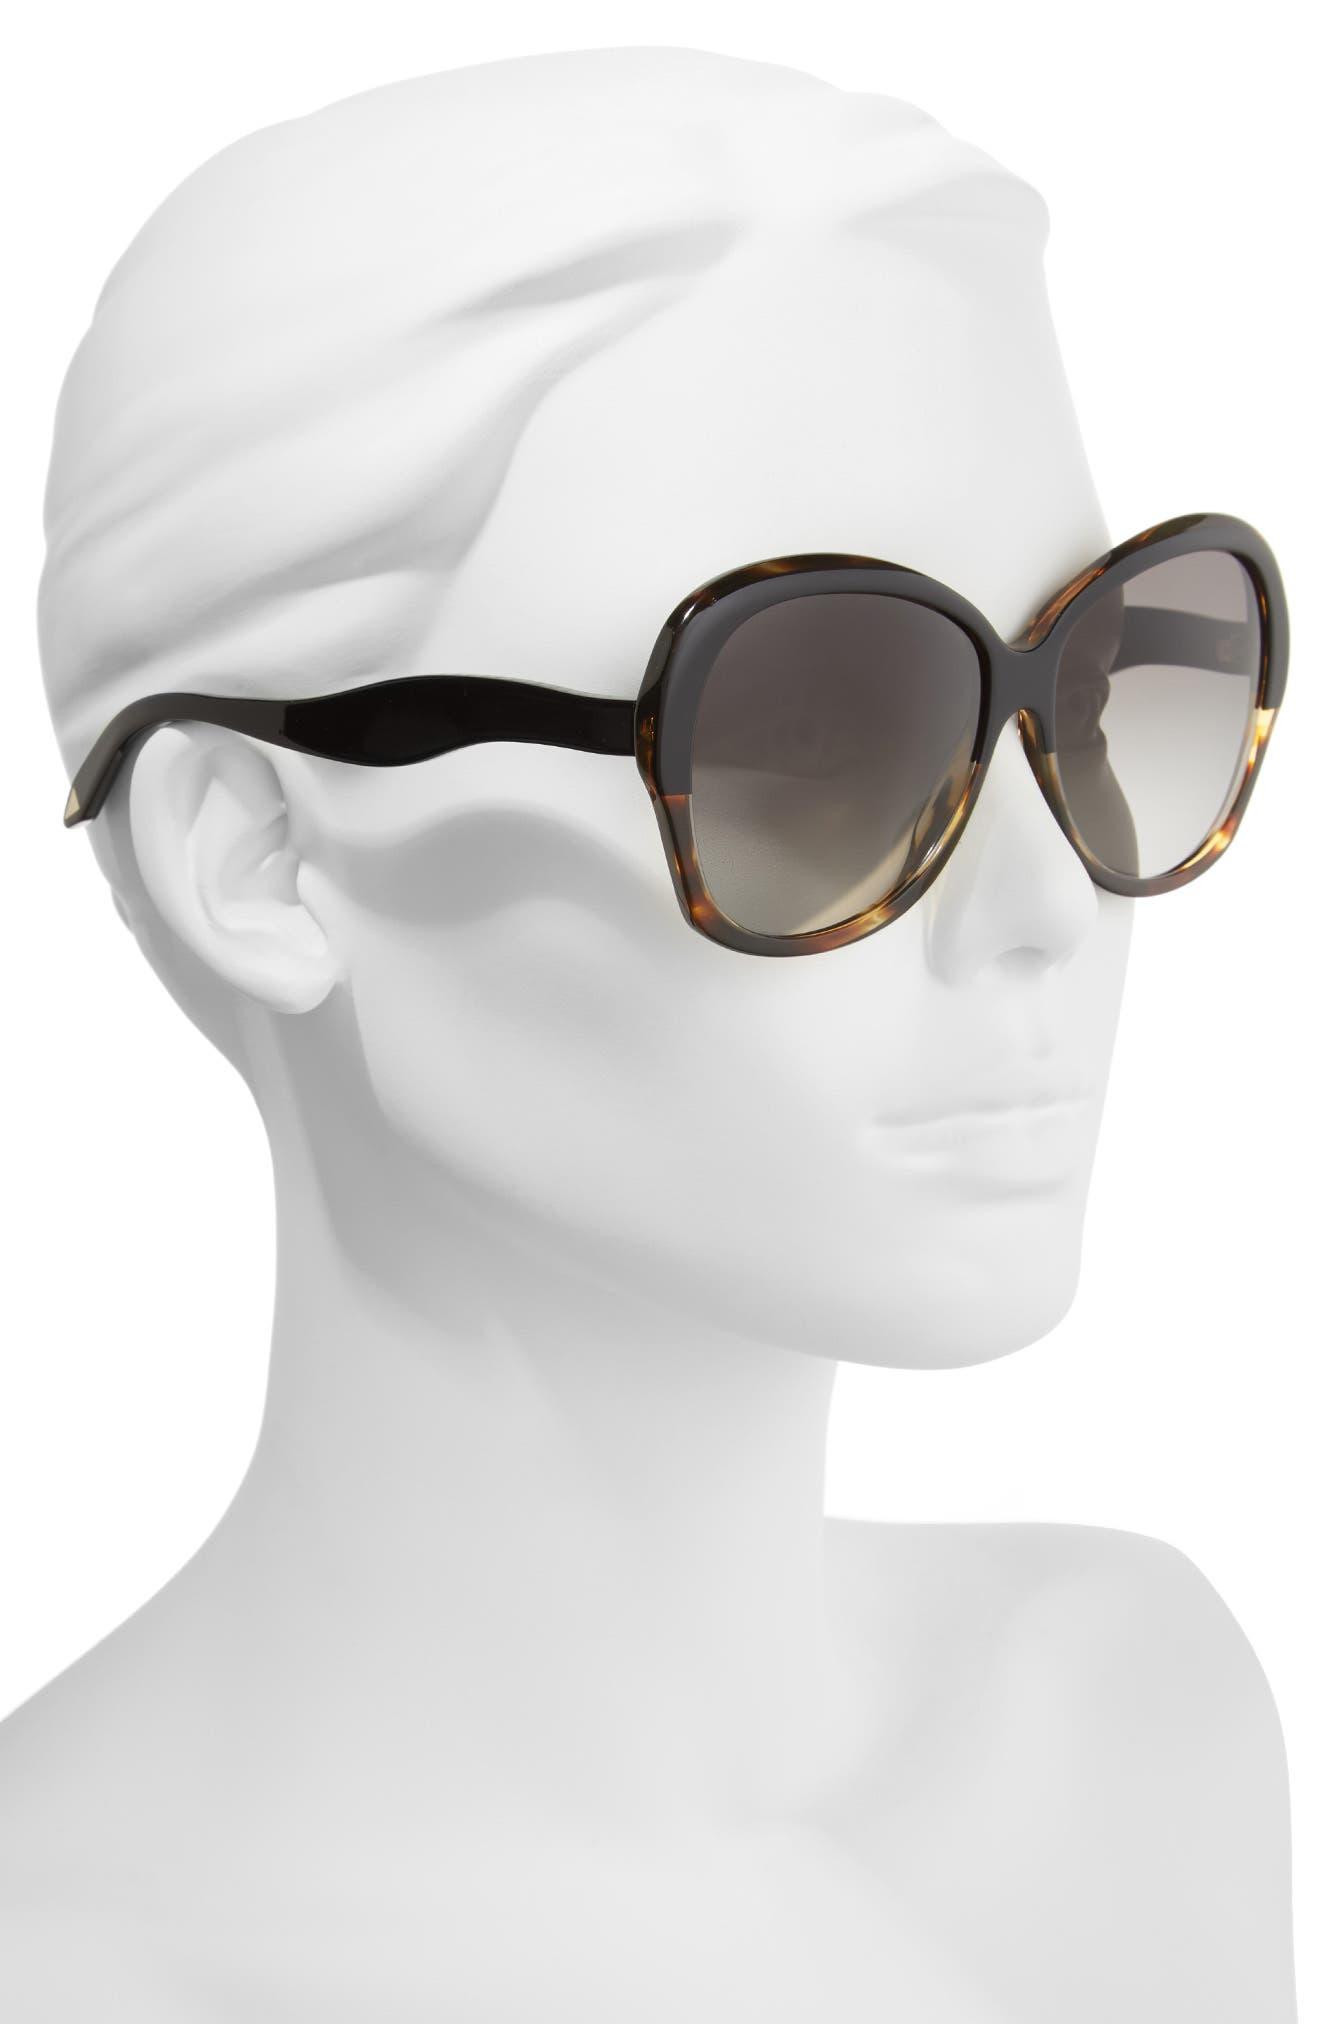 VICTORIA BECKHAM, Happy 60mm Butterfly Sunglasses, Alternate thumbnail 2, color, BLACK/ TORTOISE GRAD